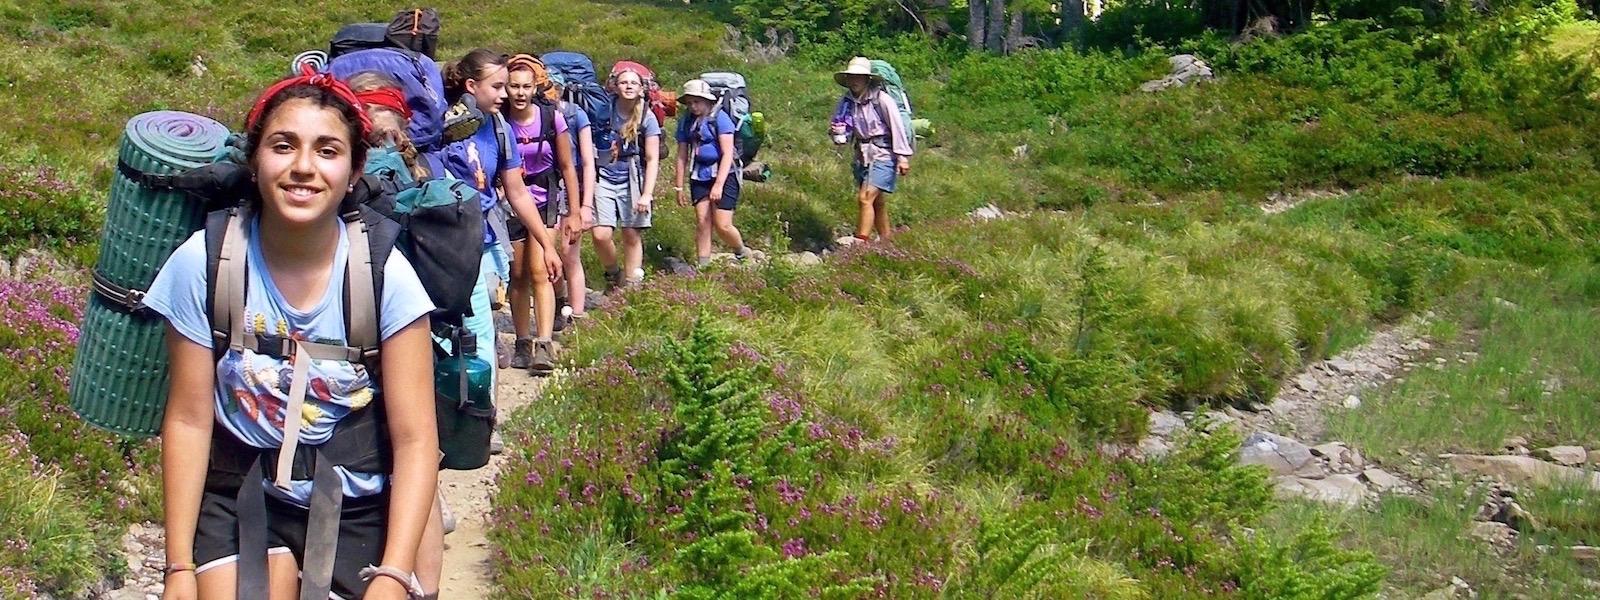 Girls Leadership Summer Camp Outdoors